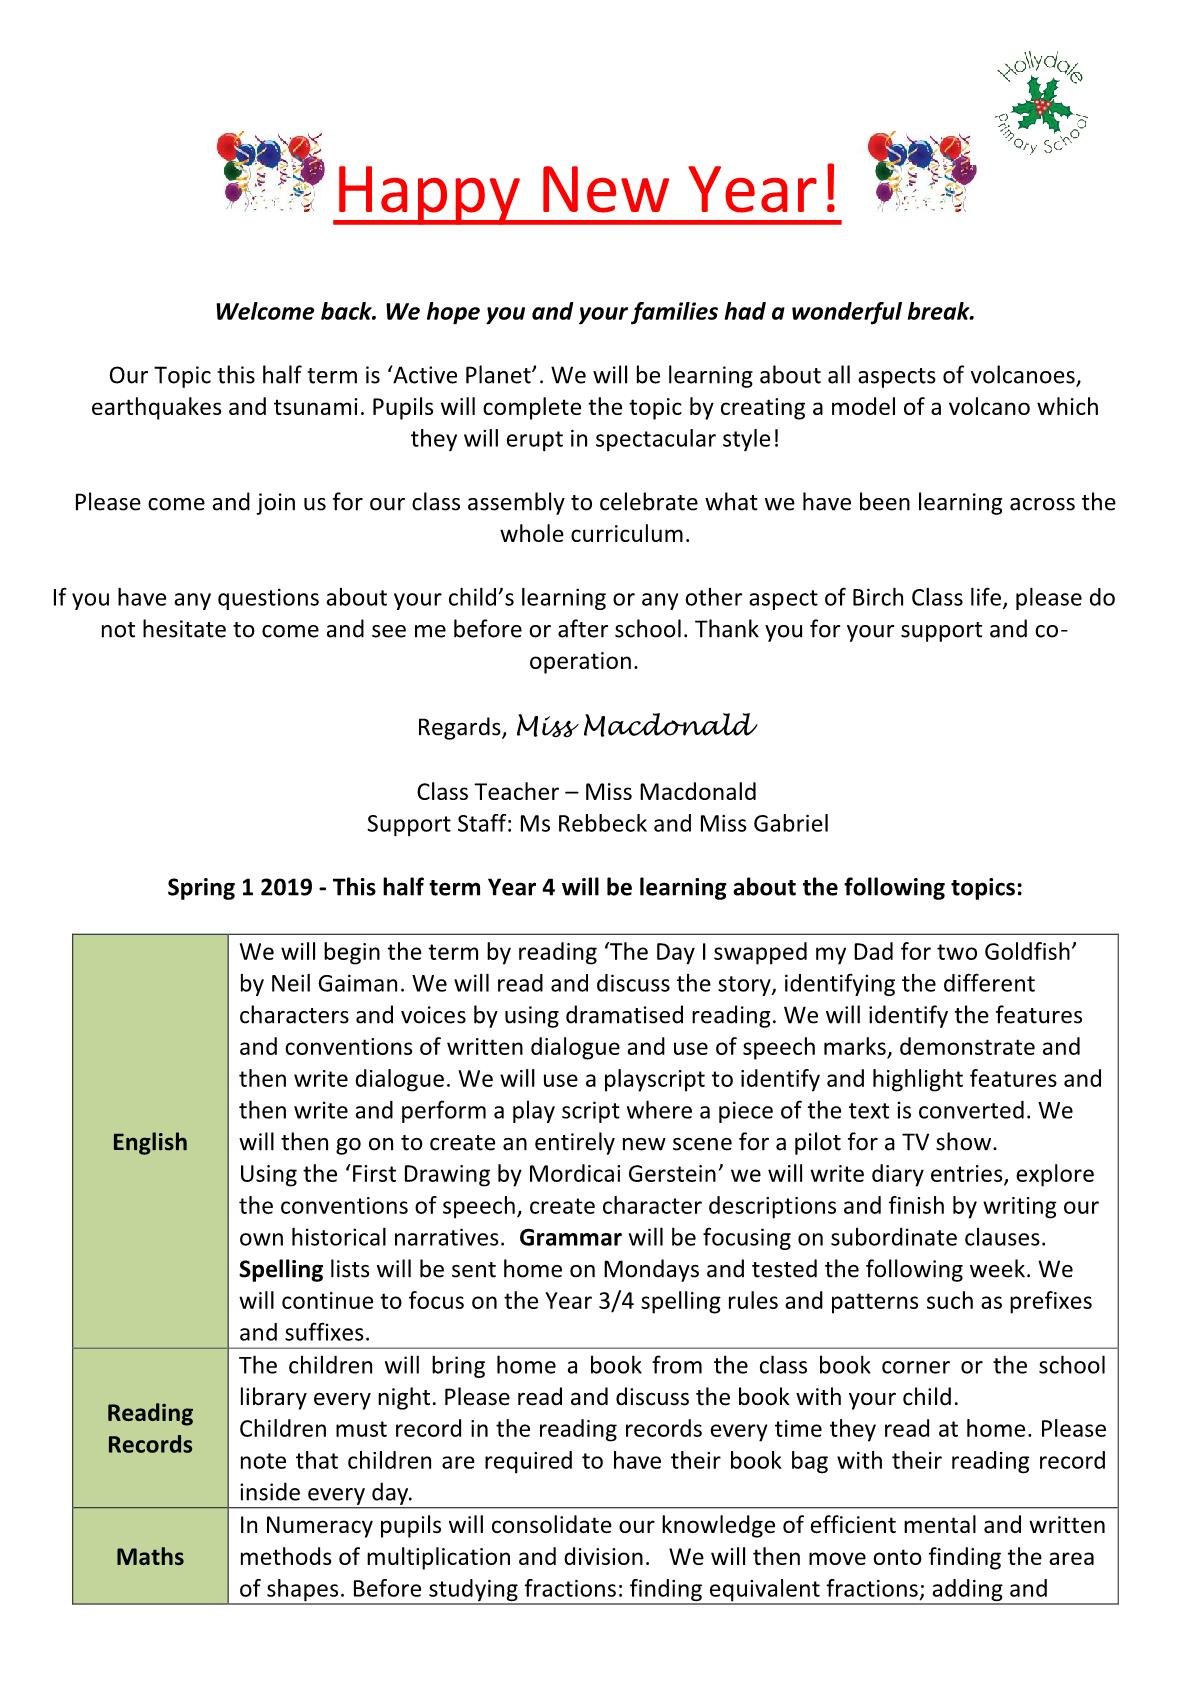 LKS2 Curriculum Newsletter 2019